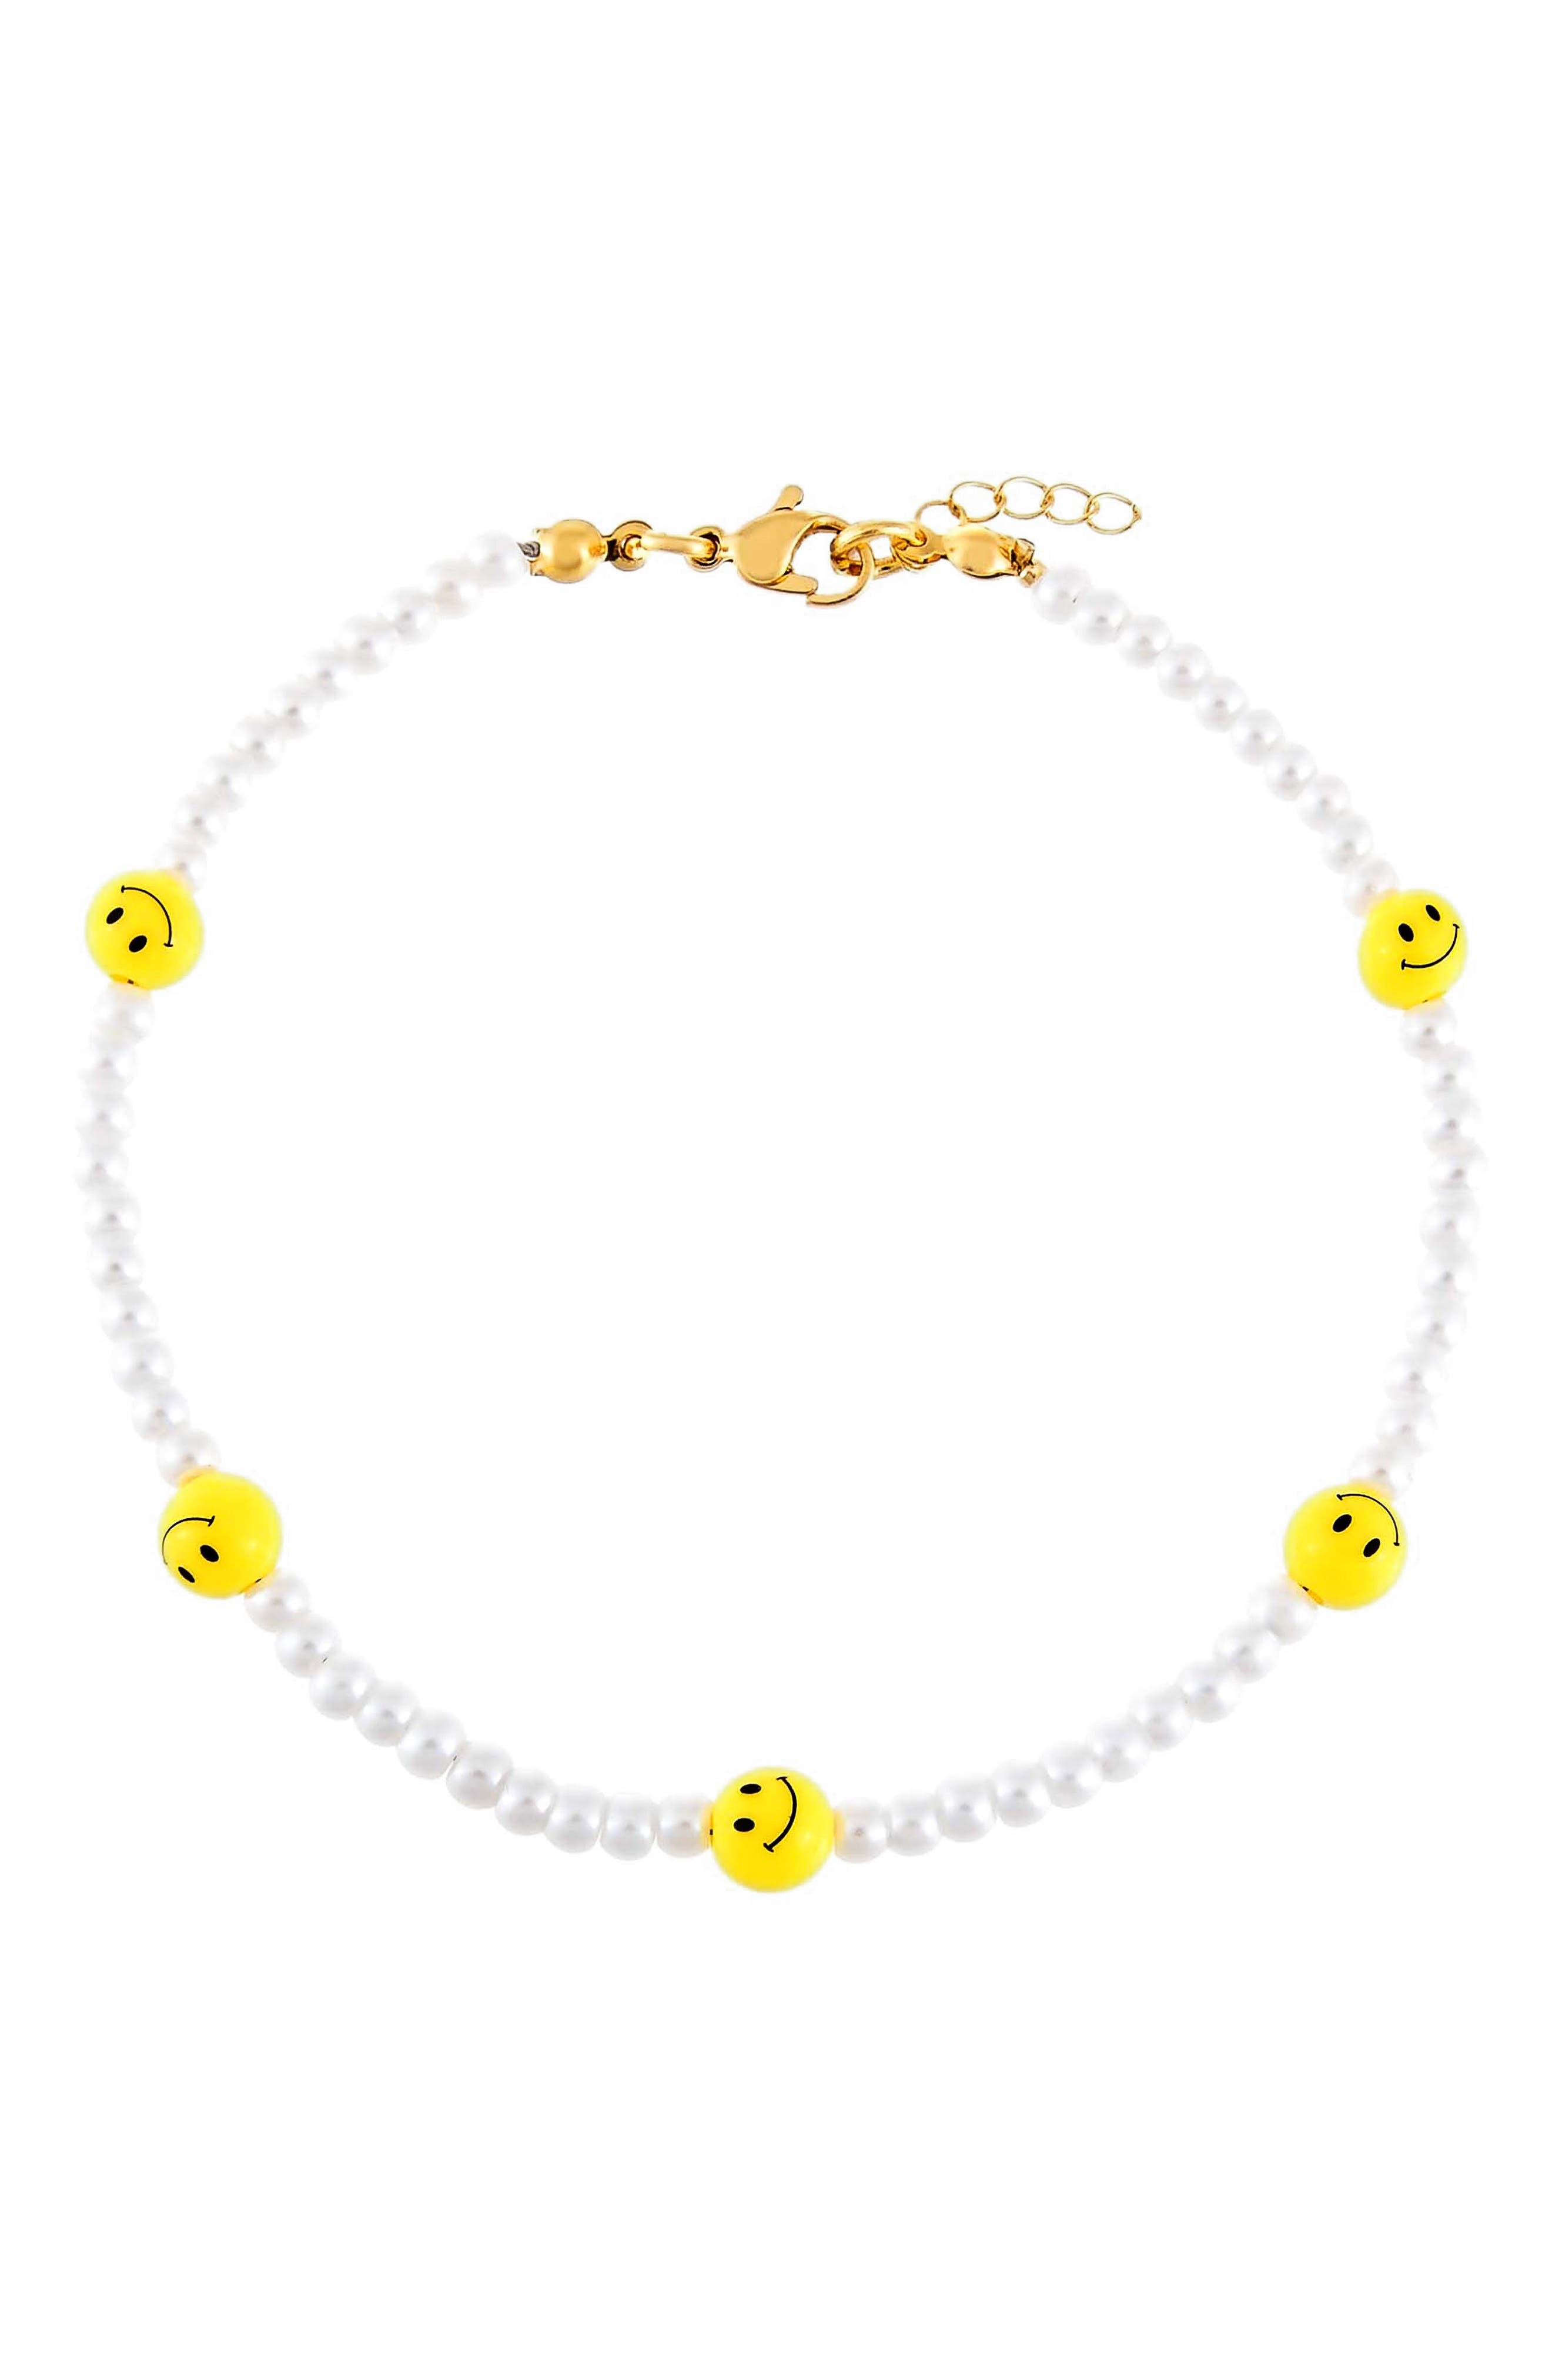 Women's Adina's Jewels Imitation Pearl Smiley Beaded Anklet